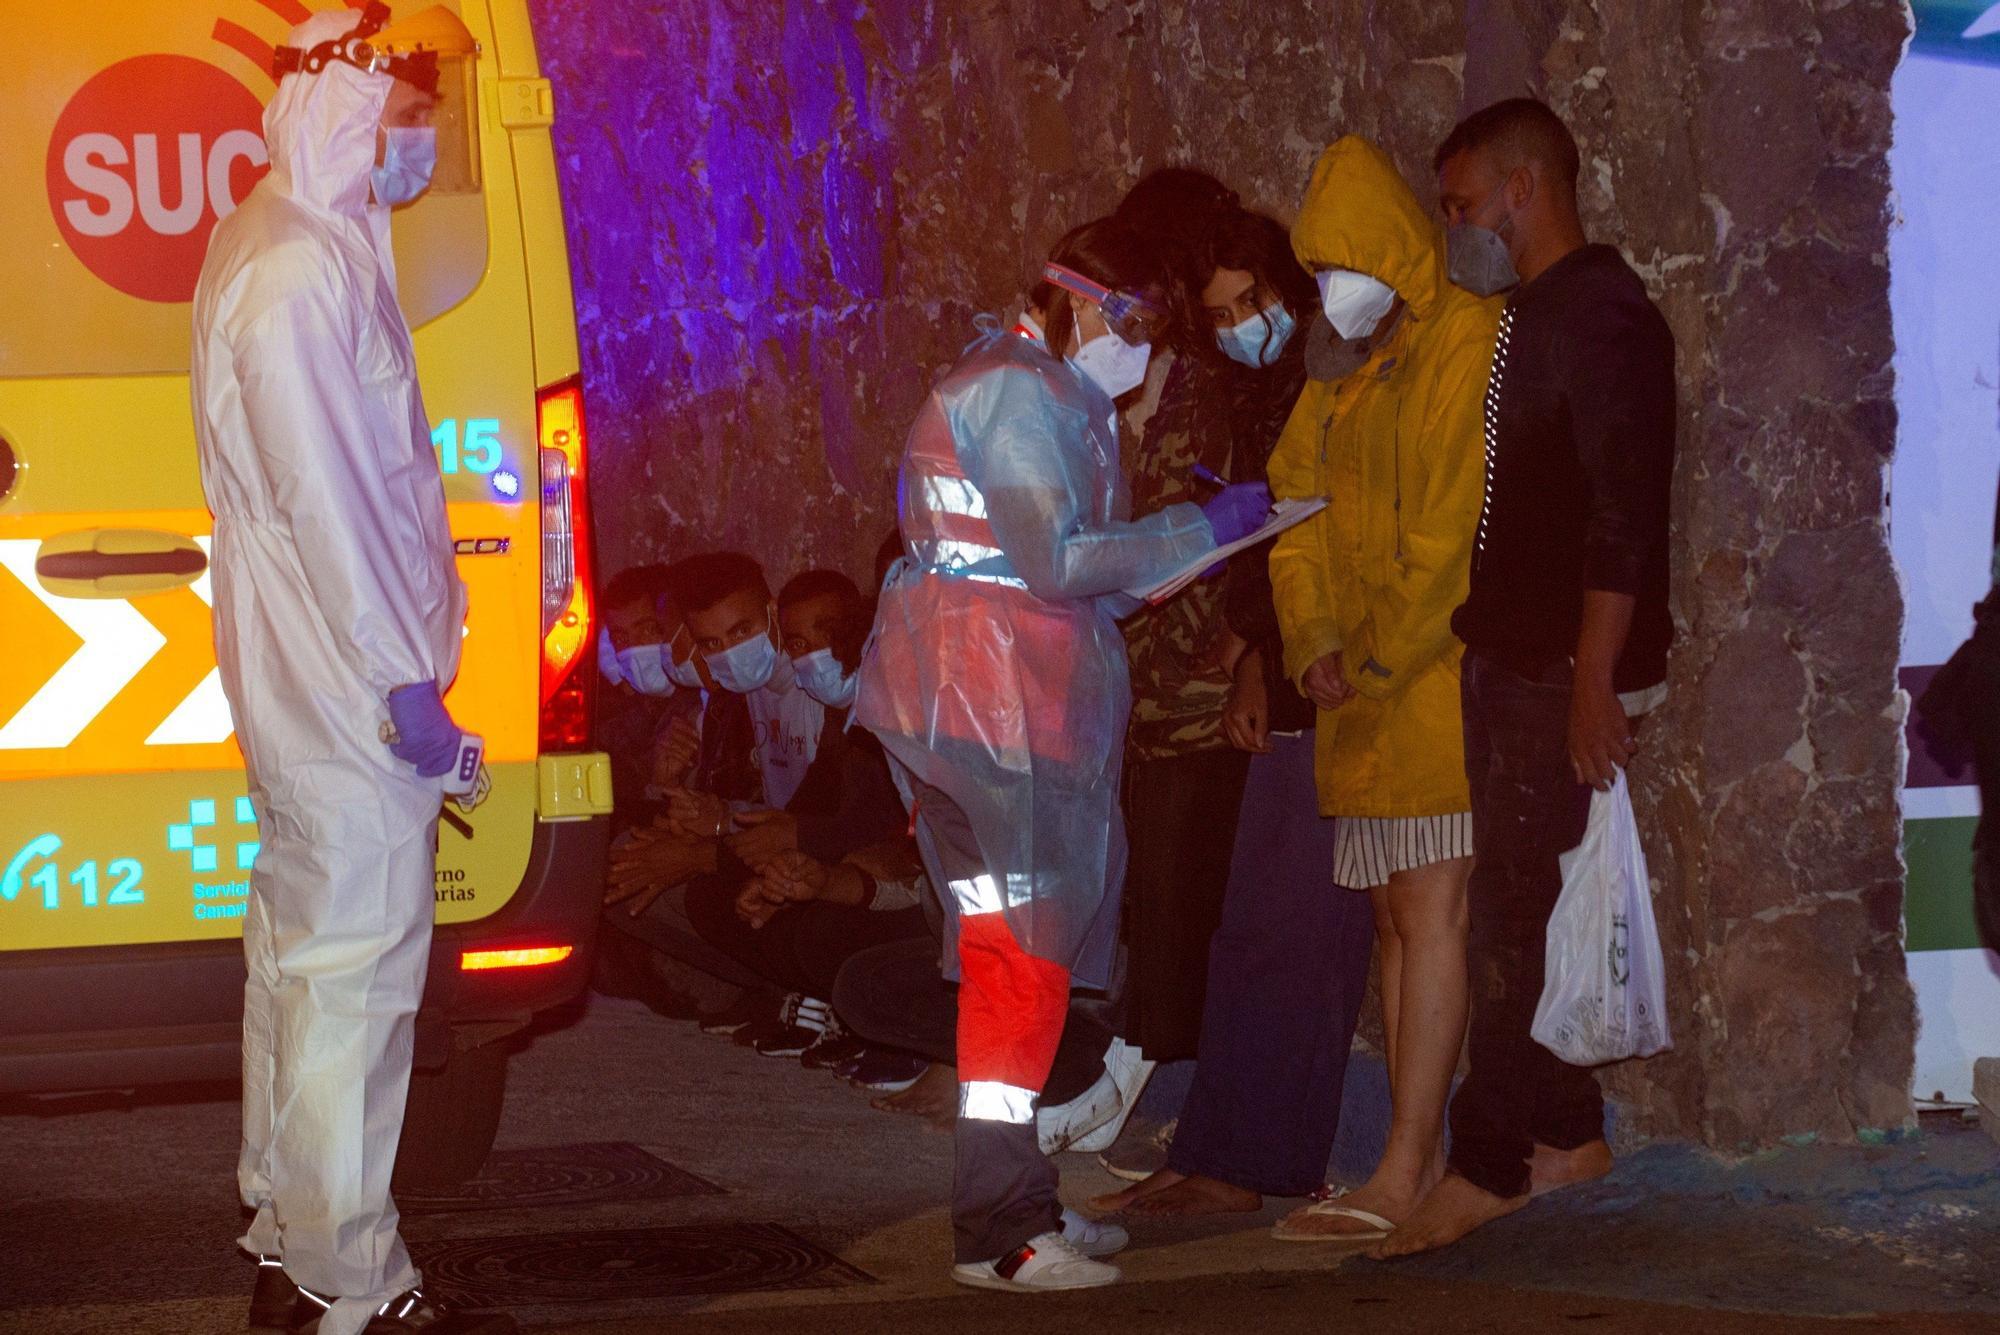 Llegada de migrantes a Canarias (13/07/21)